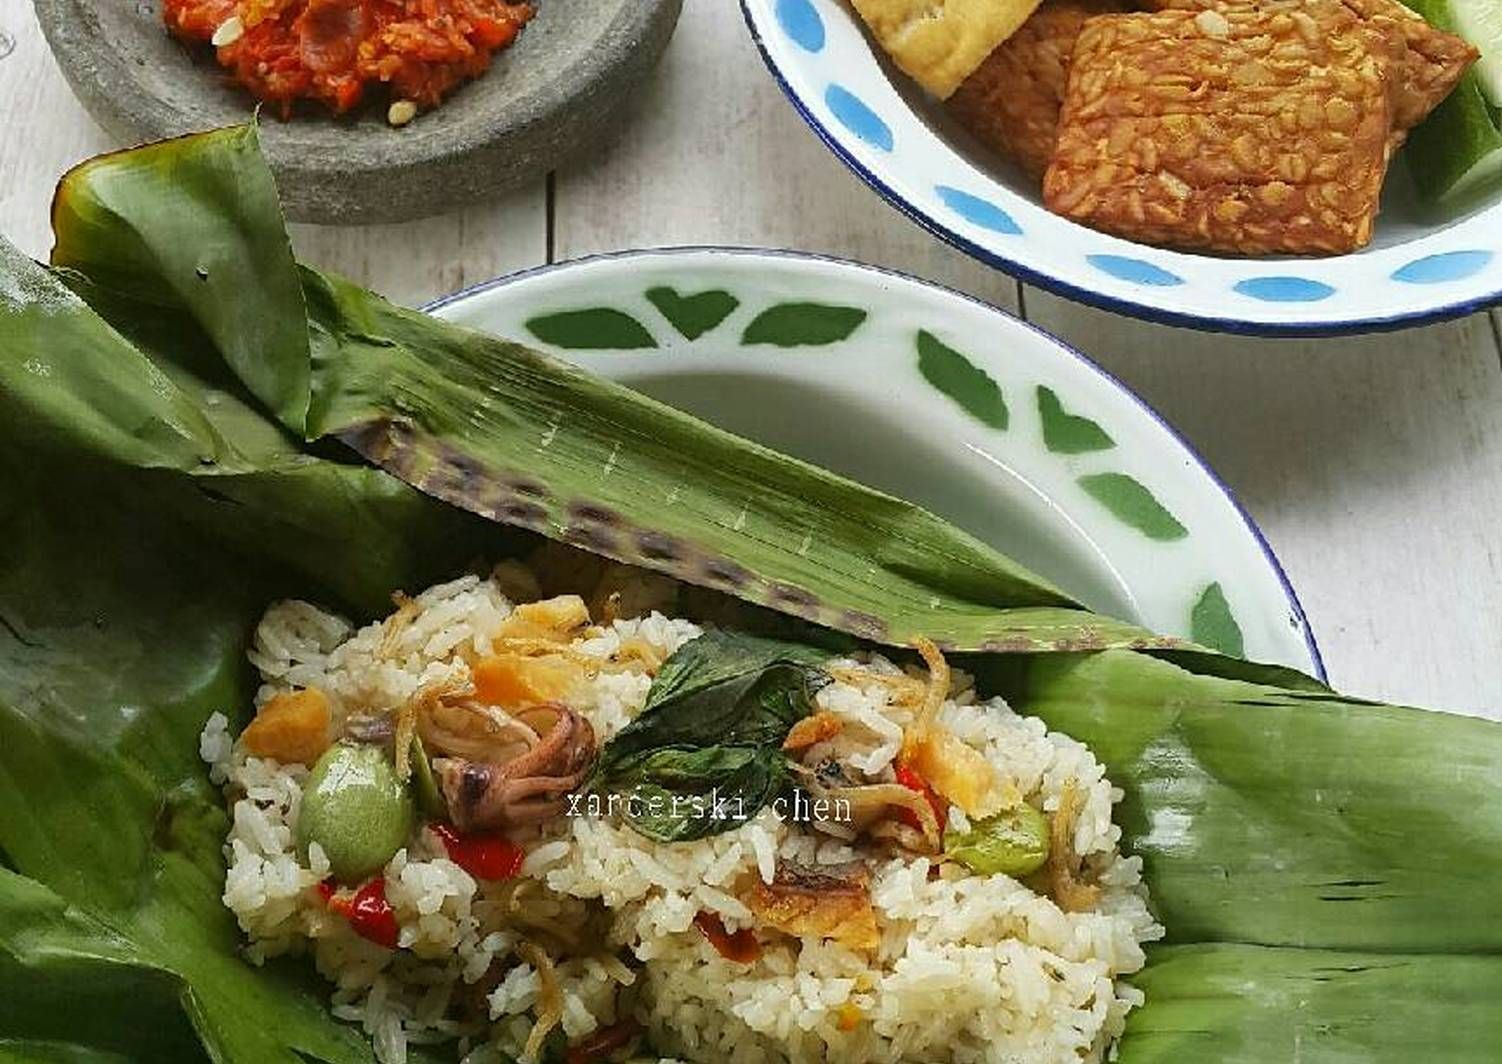 Resep Nasi Liwet Bakar Oleh Xander S Kitchen Resep Resep Masakan Indonesia Makanan Sehat Resep